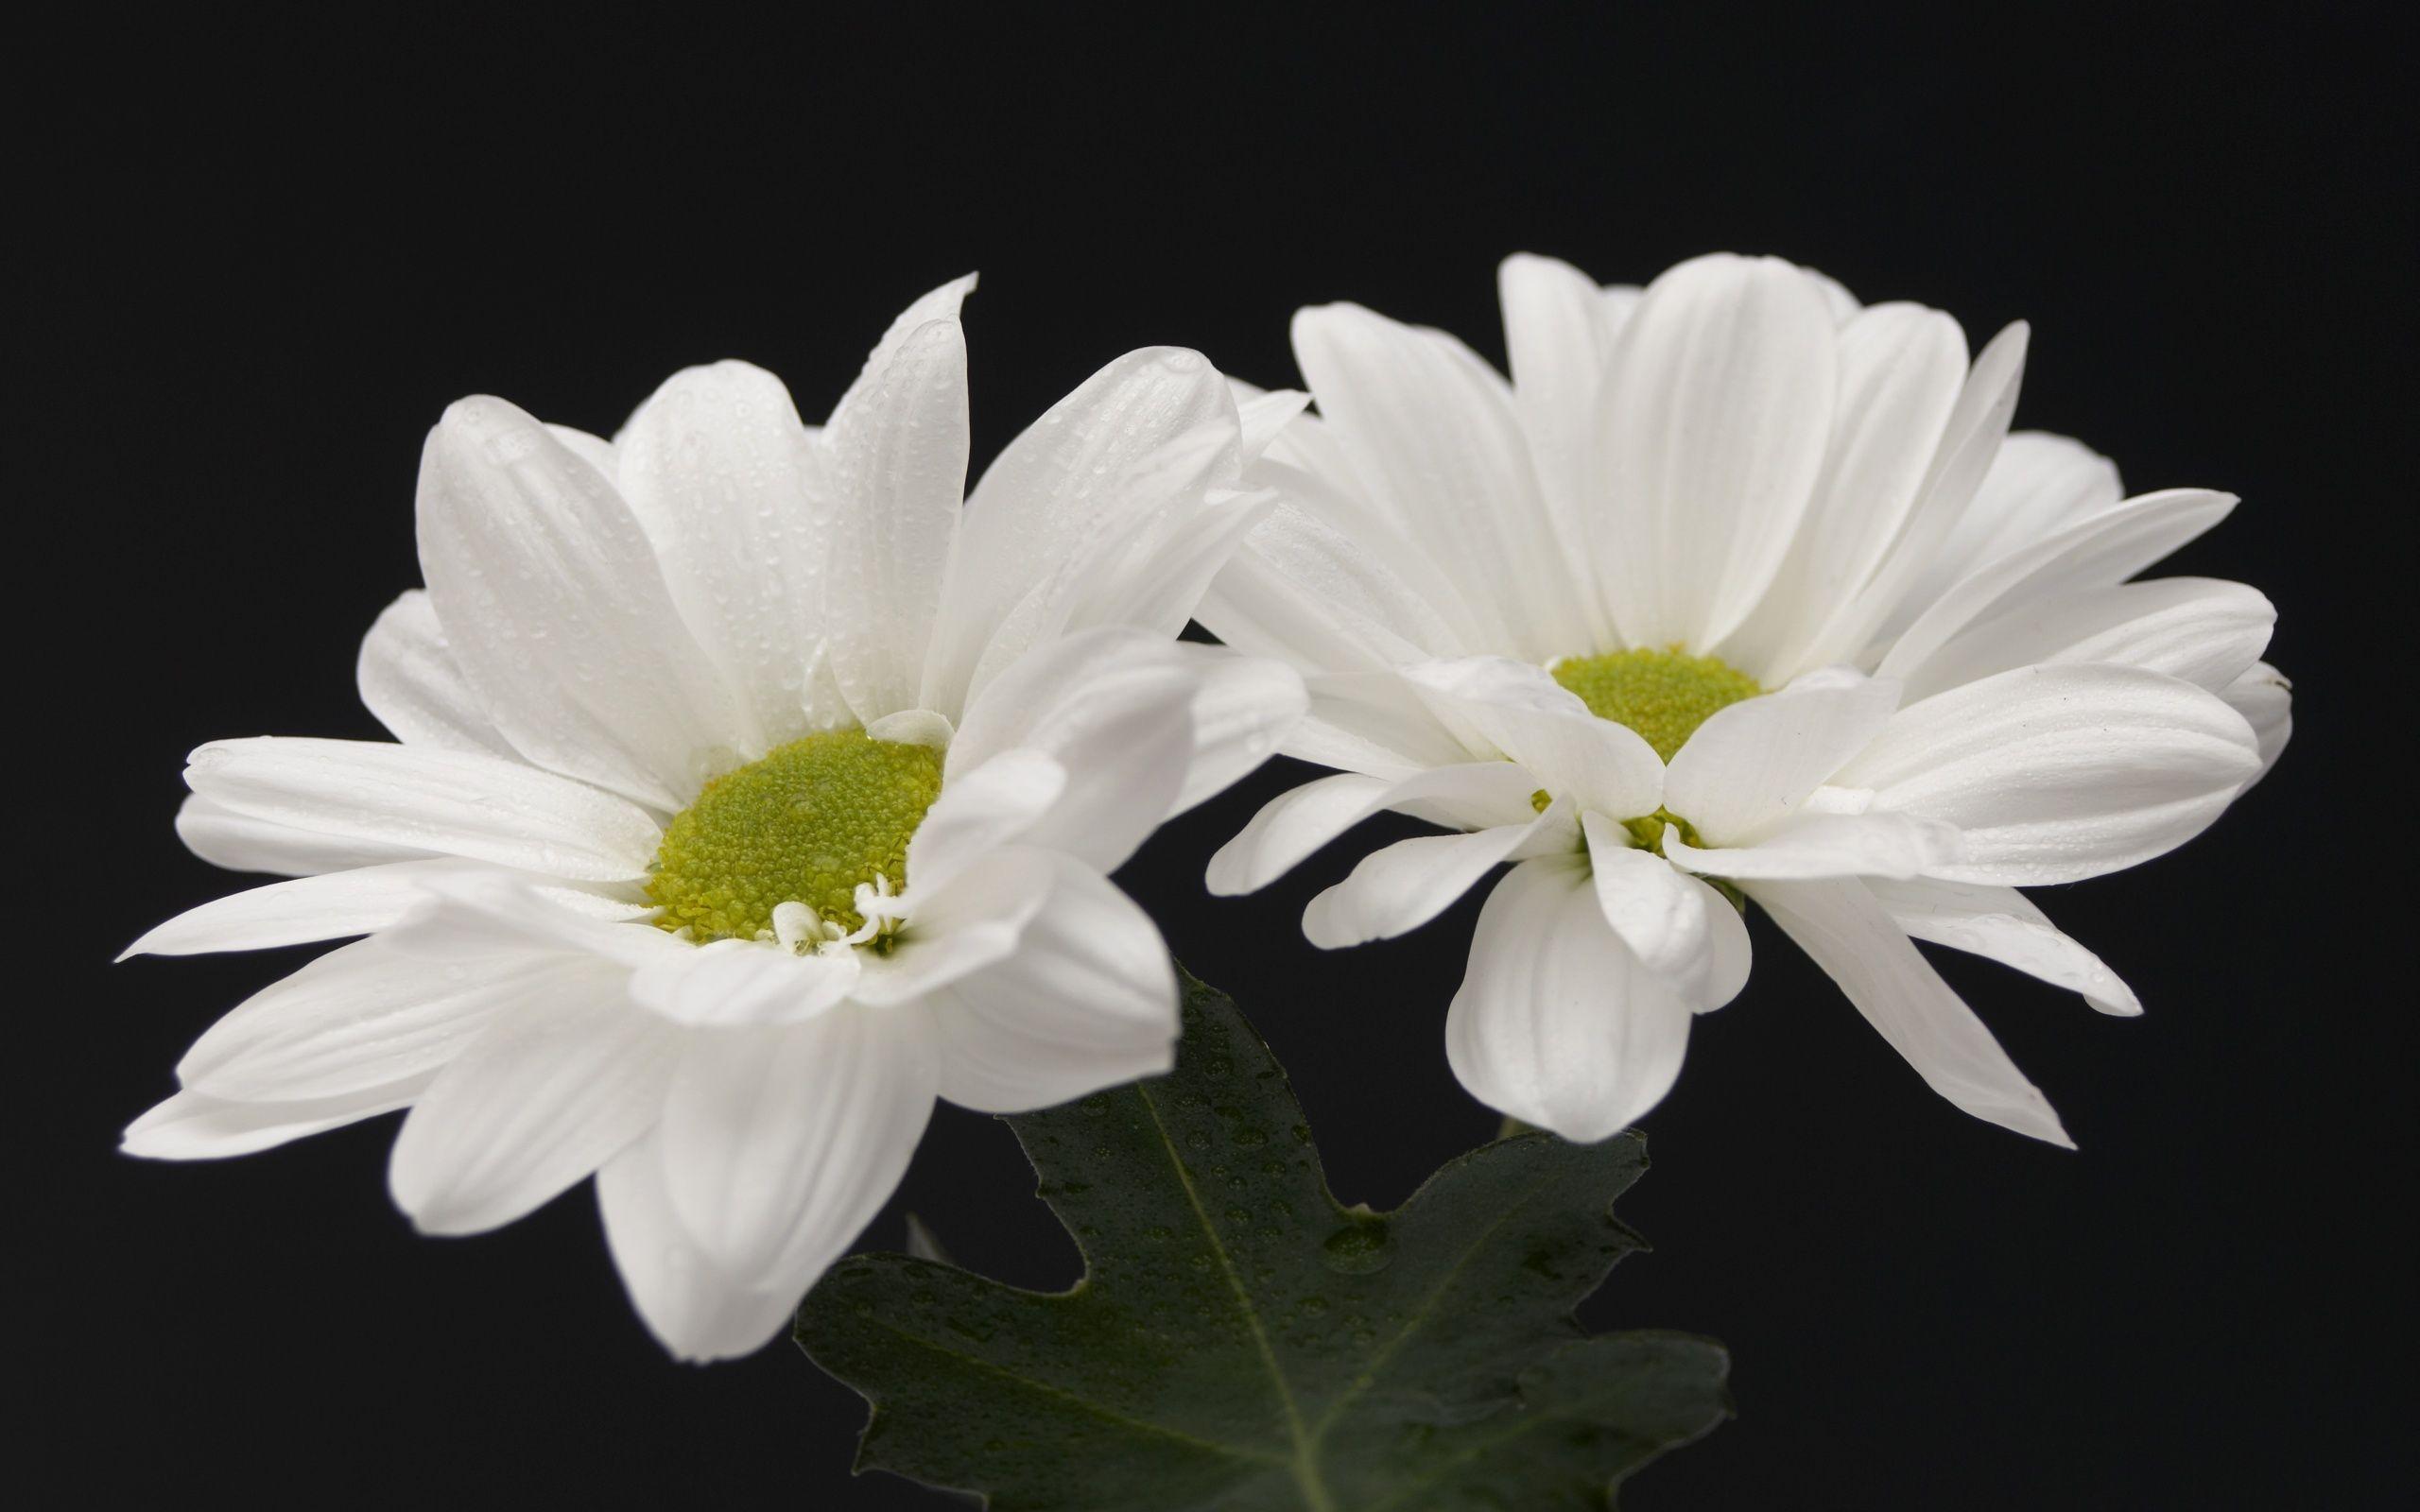 Flowers clip art 2560x1600 two white flowers desktop pc and mac flowers clip art 2560x1600 two white flowers desktop pc and mac wallpaper mightylinksfo Gallery